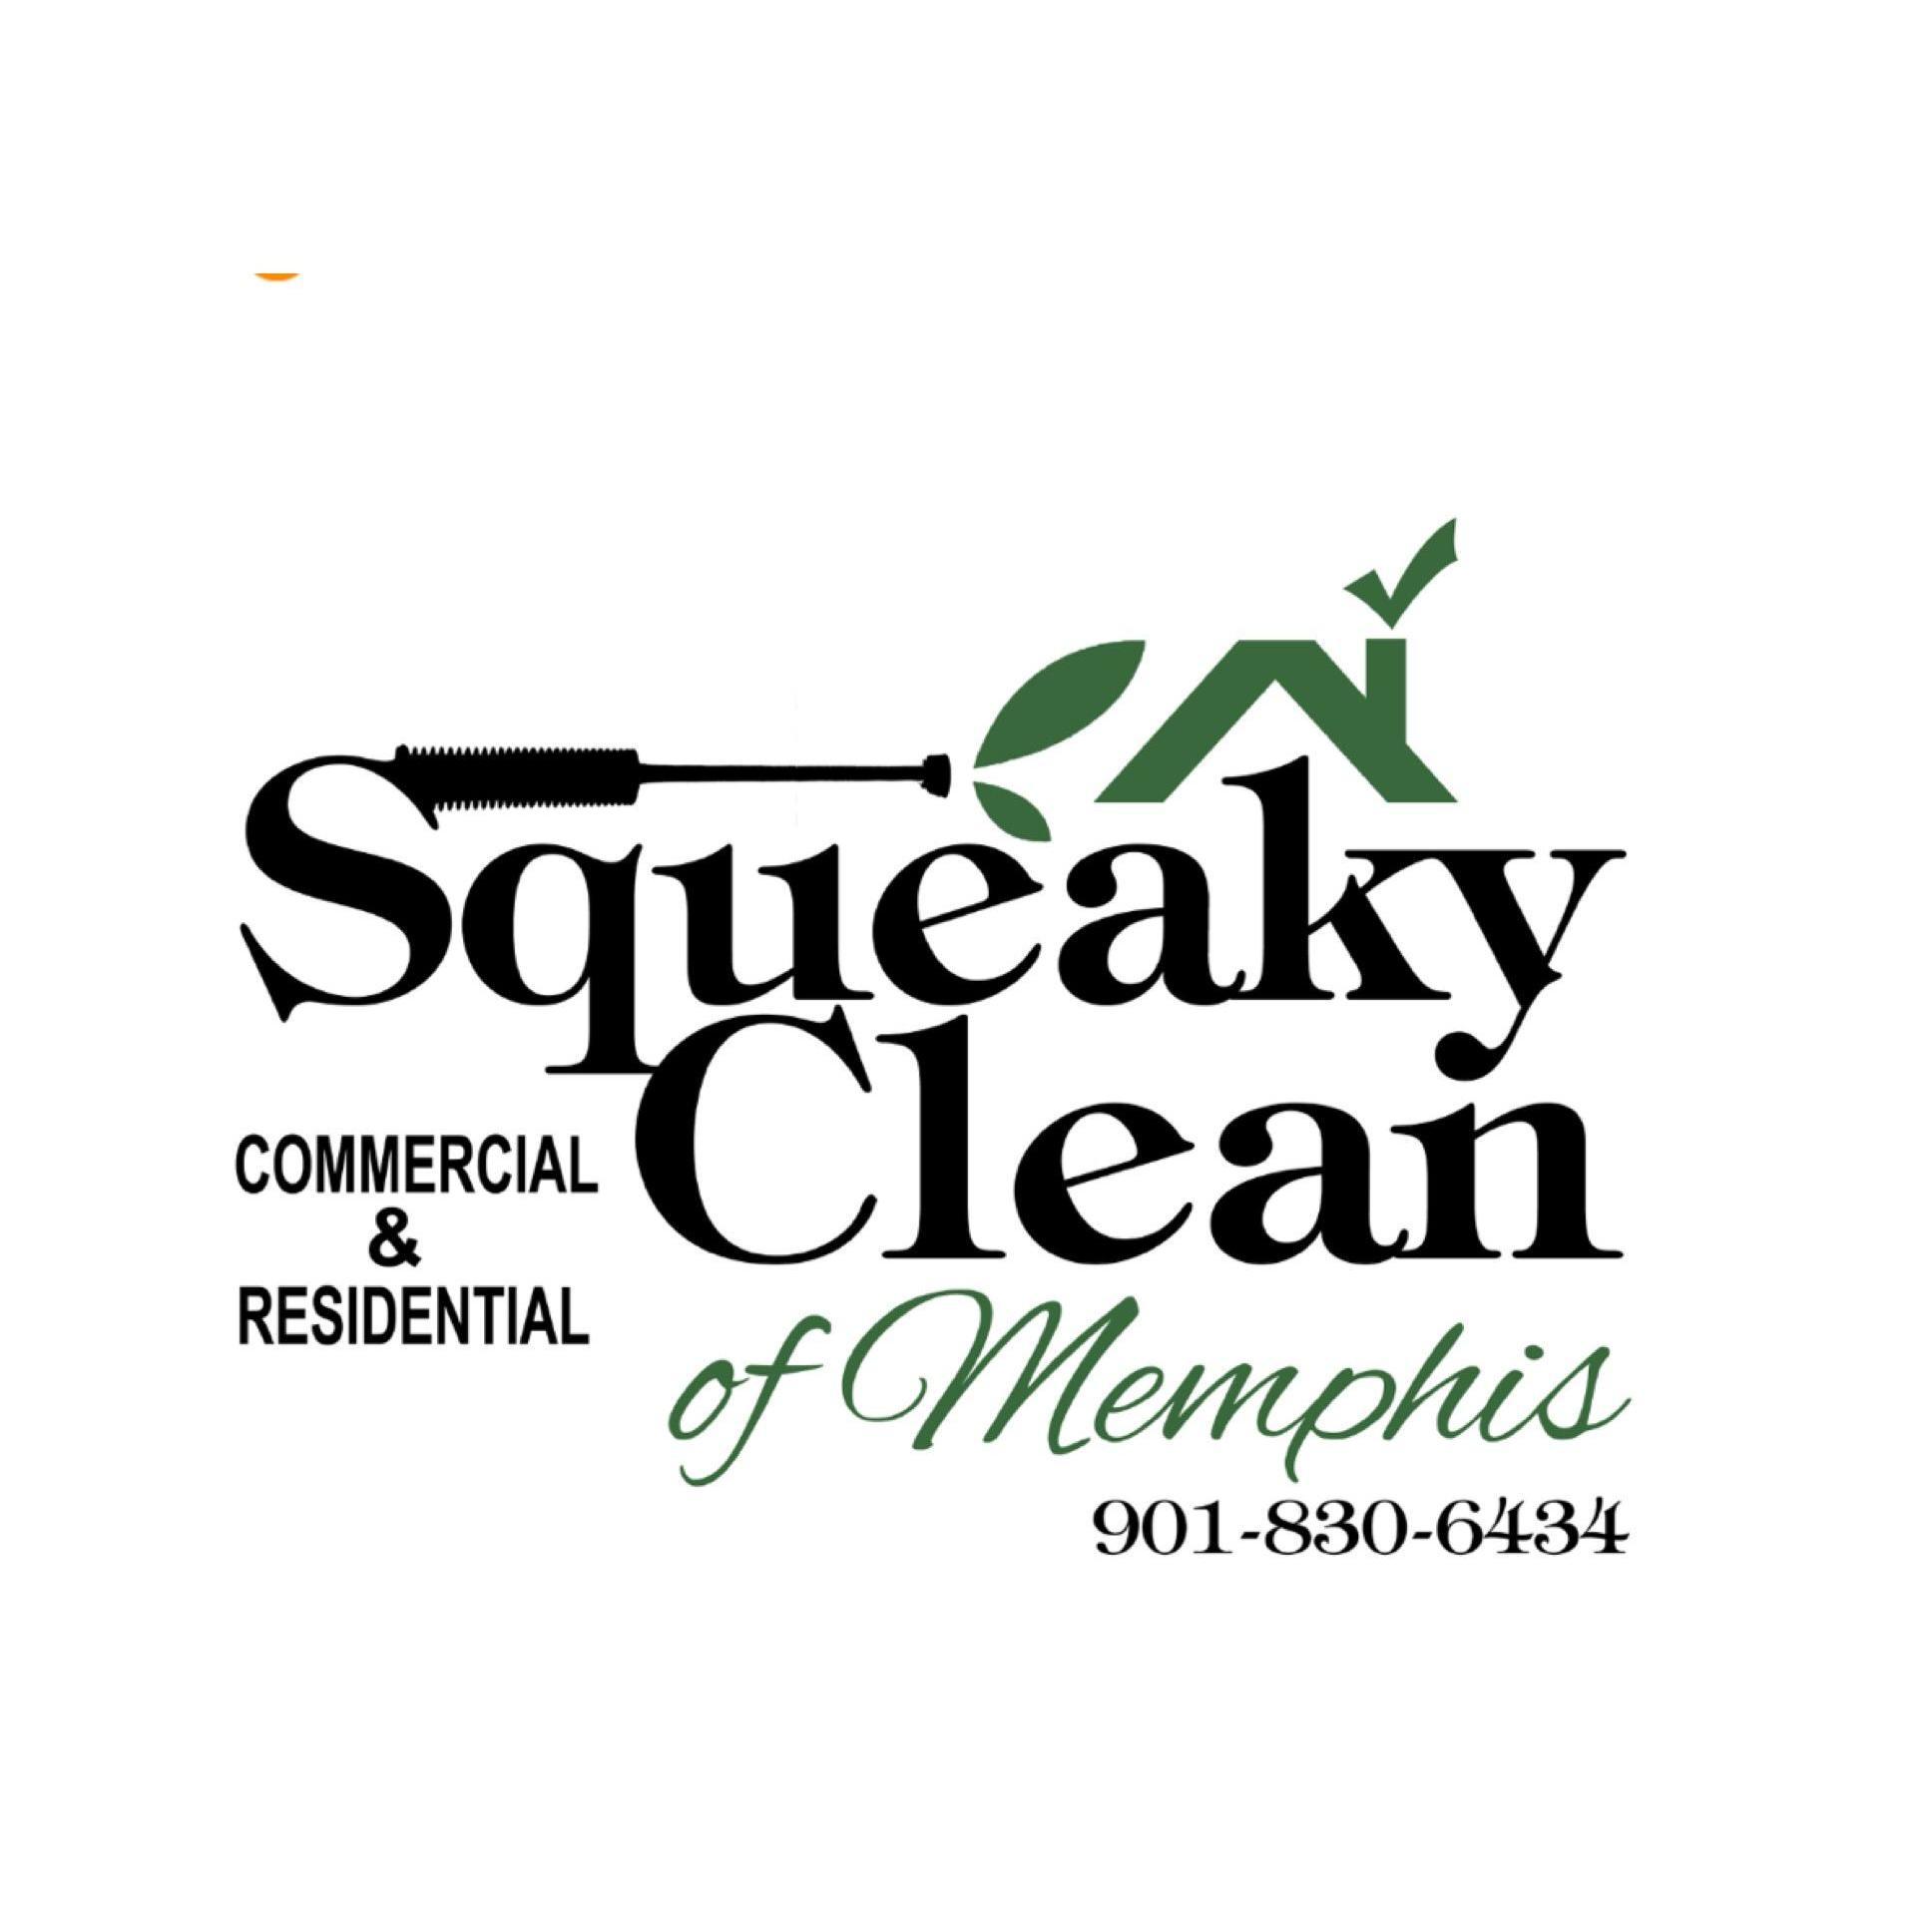 Squeaky Clean of Memphis